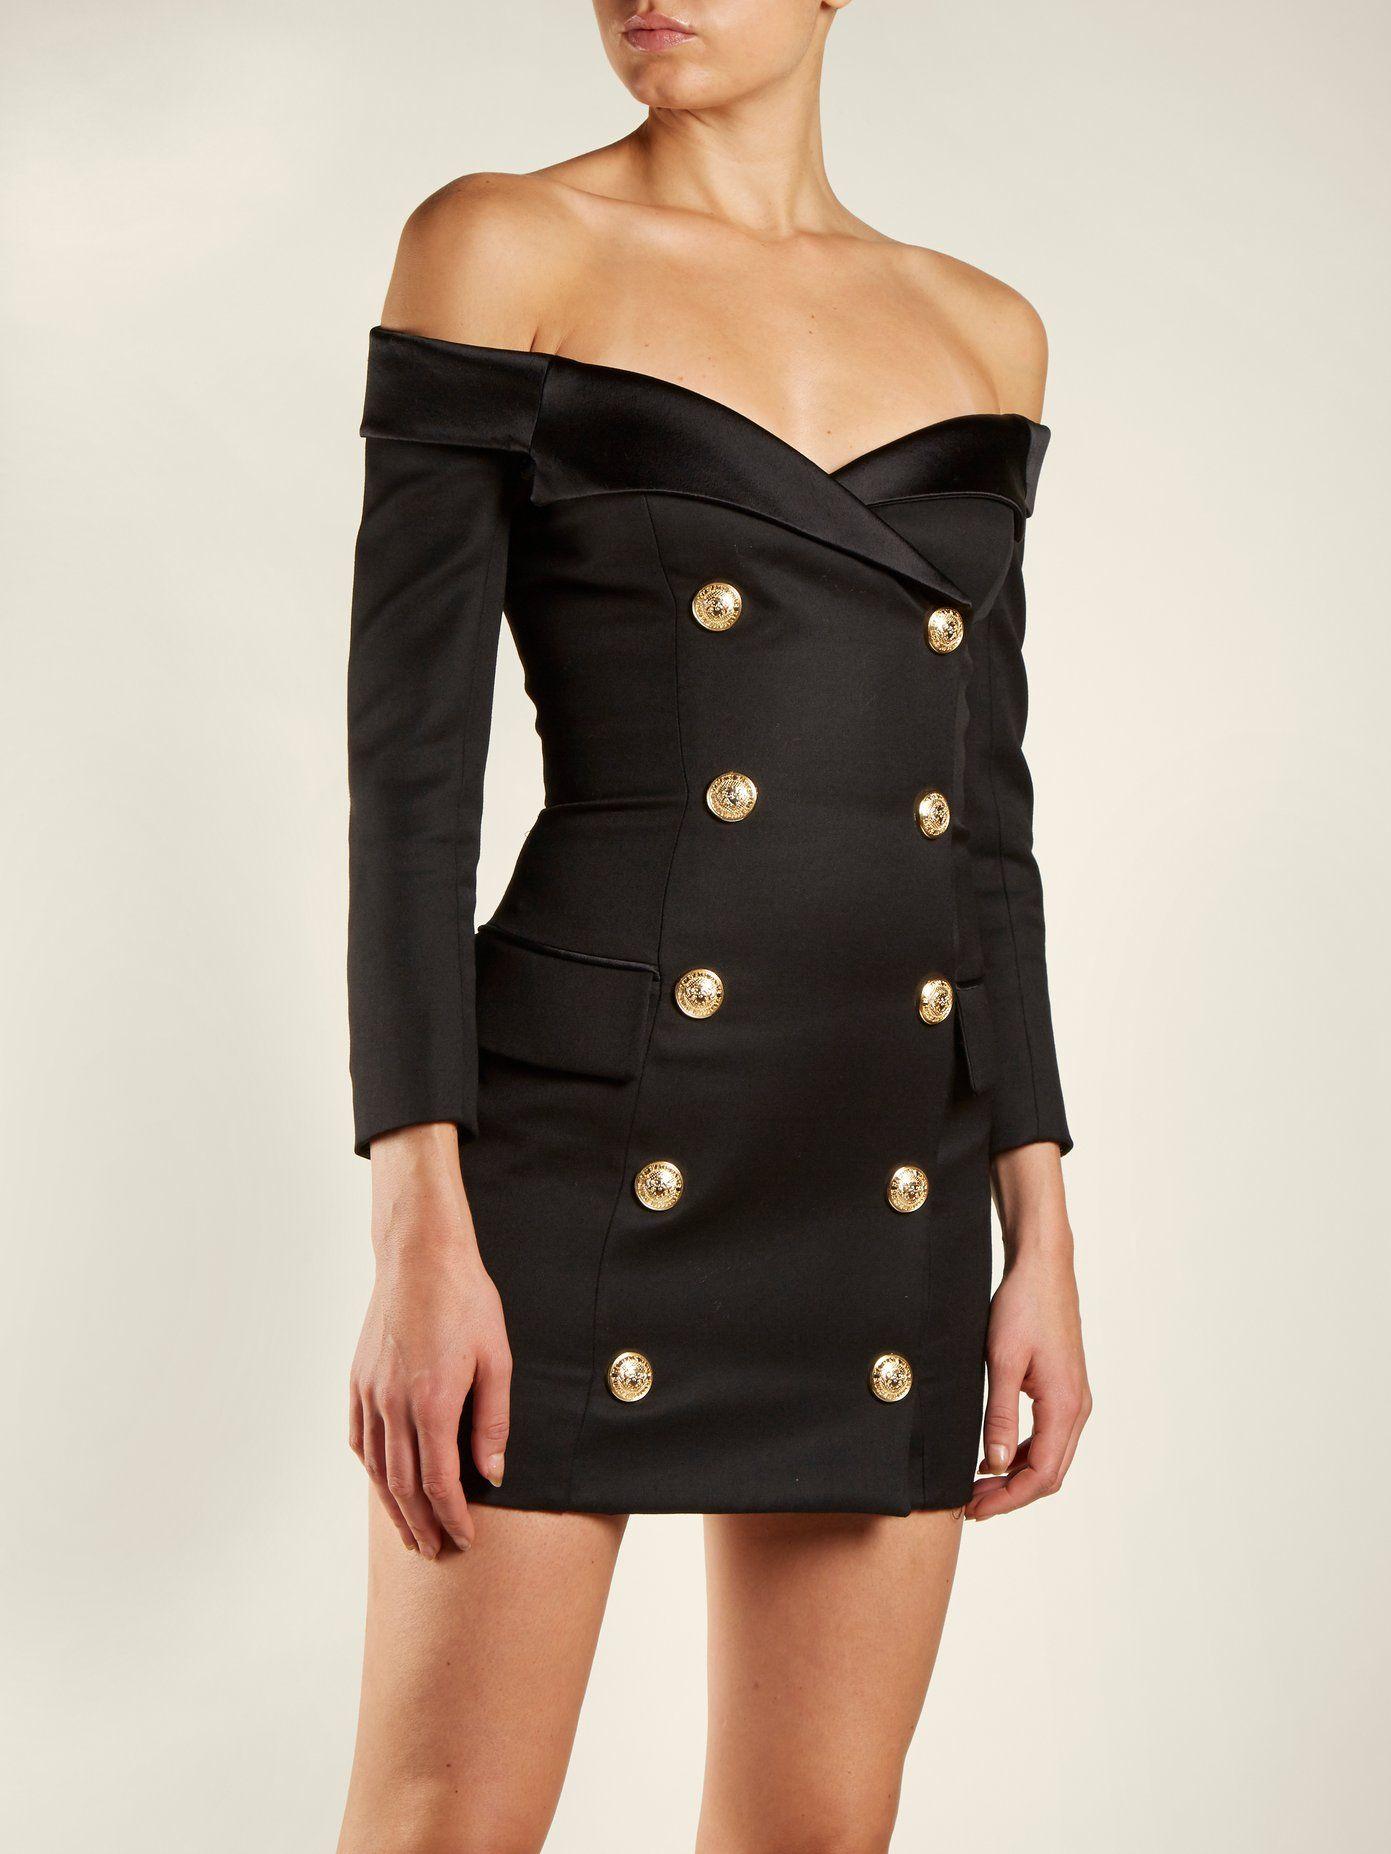 9bf82668 Off-the-shoulder button-embellished dress | Balmain | Fashion Lust ...